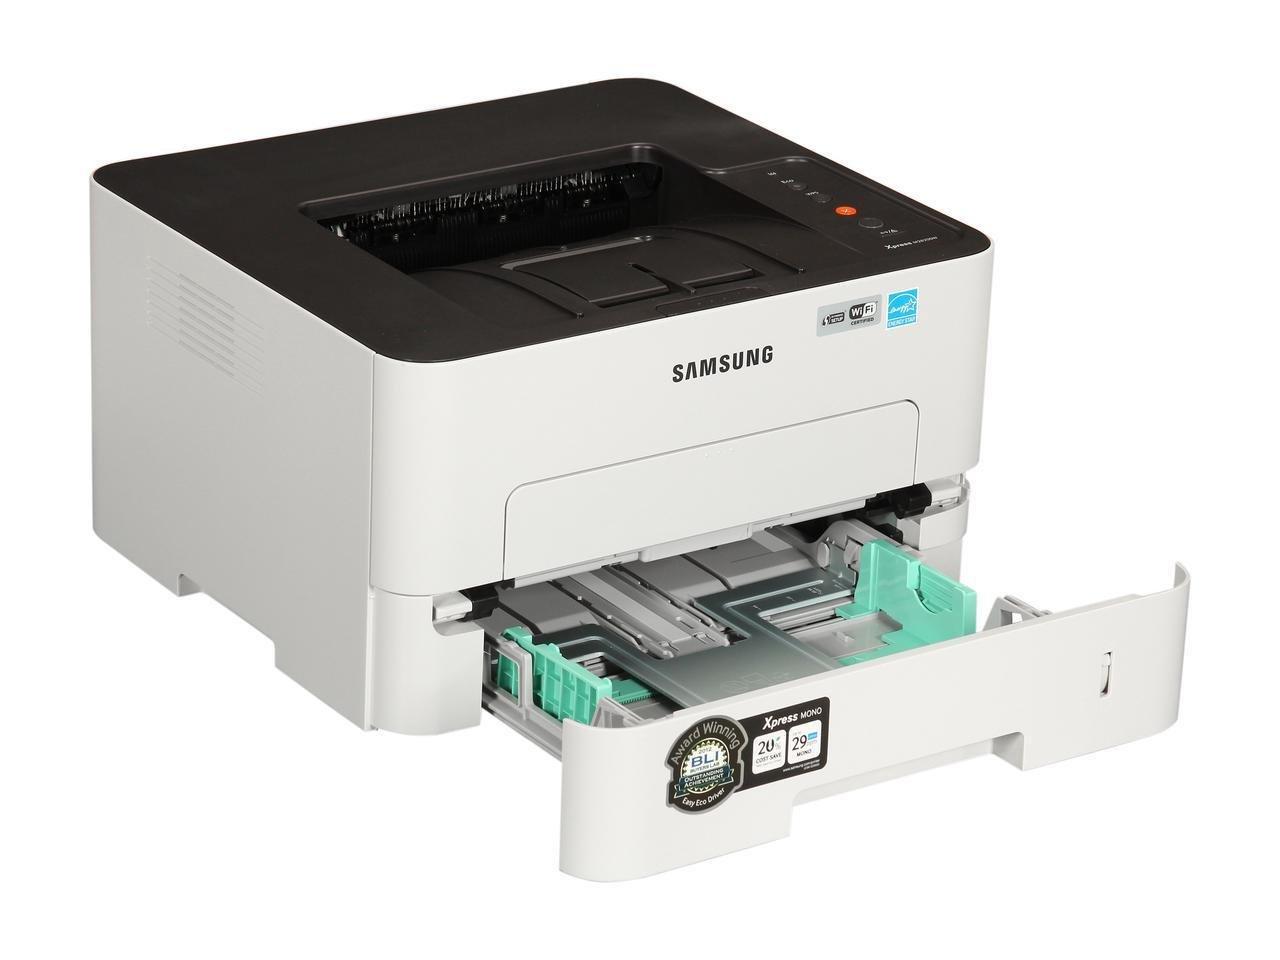 Amazon.com: Samsung Xpress M3015DW impresora láser ...